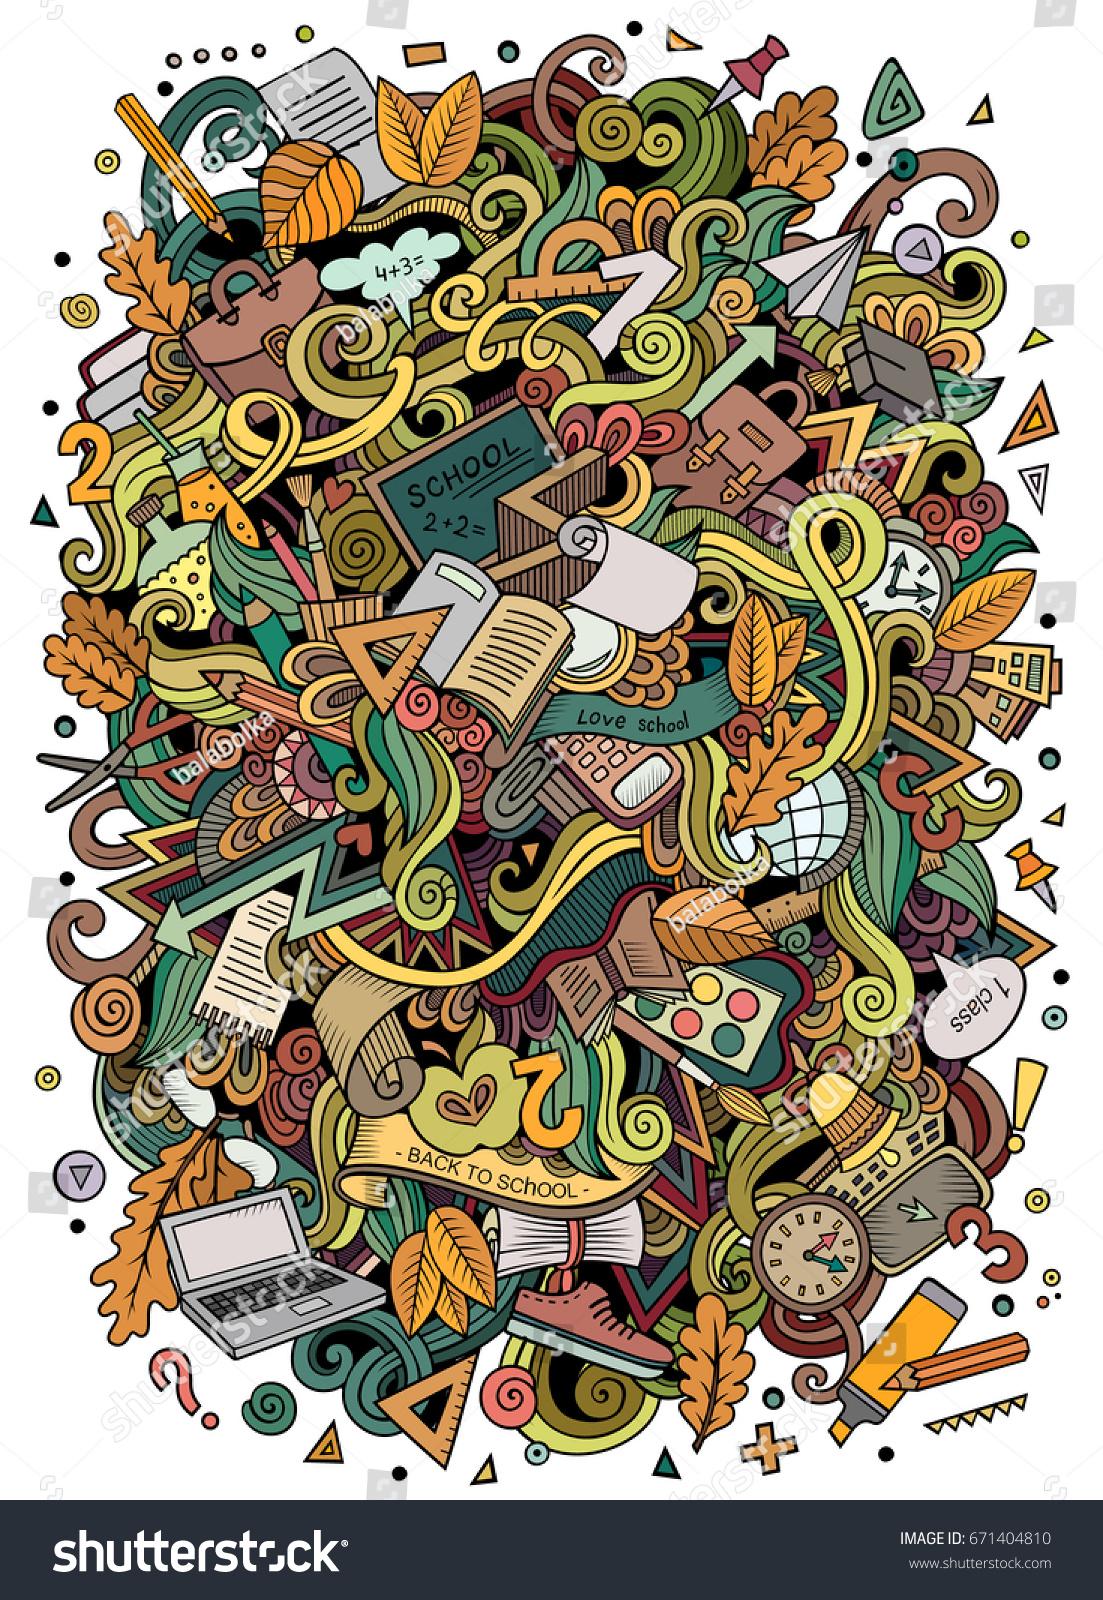 Cartoon Cute Doodles Hand Drawn School Illustration Colorful